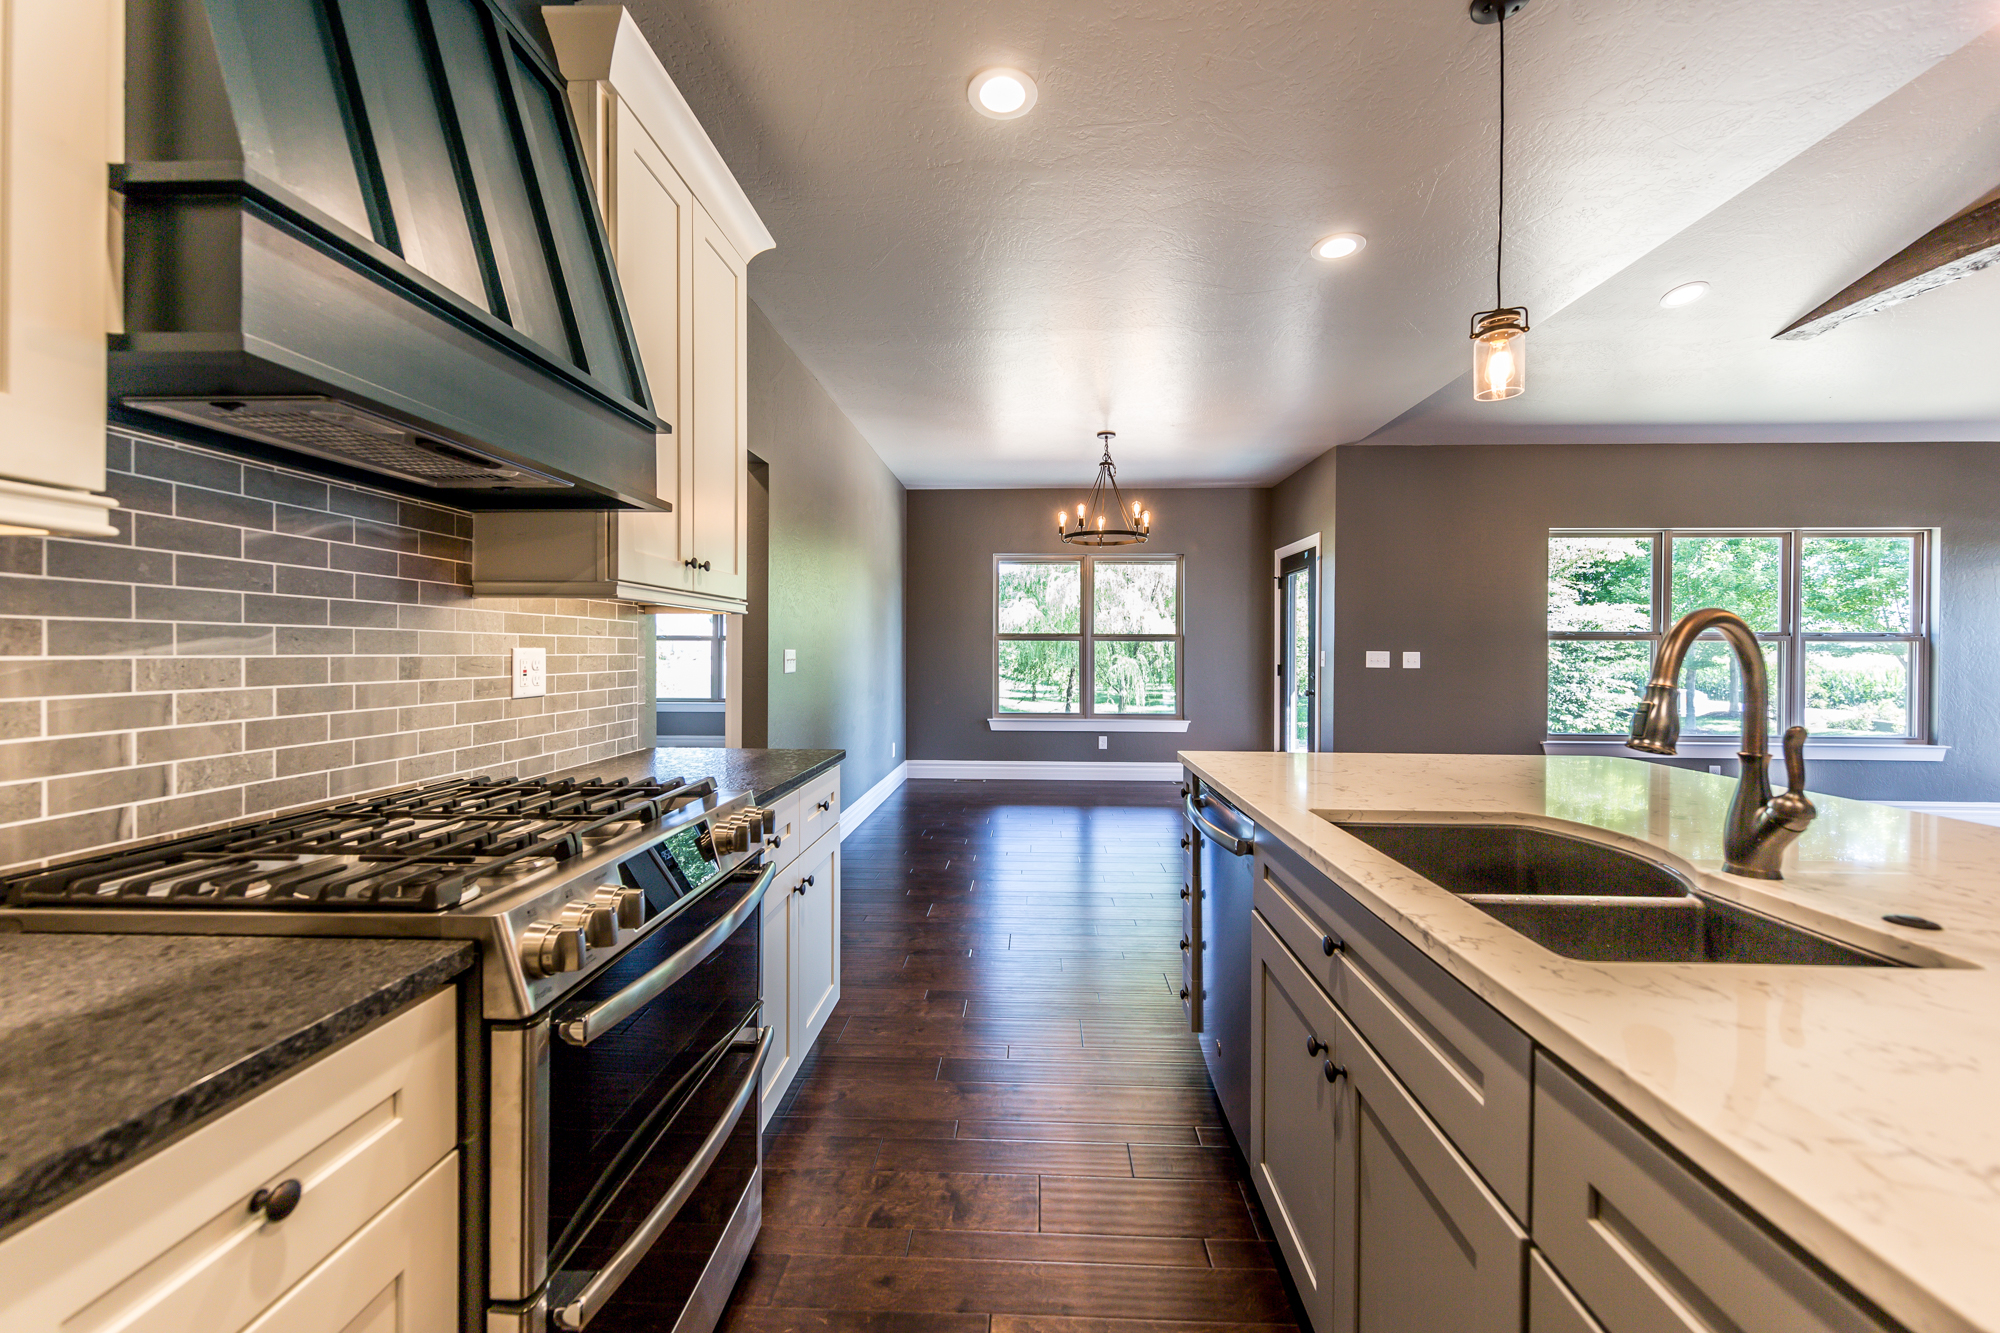 Home_For_Sale_O'Fallon_Illinois_Scott_AFB_CR_Holland-12.jpg